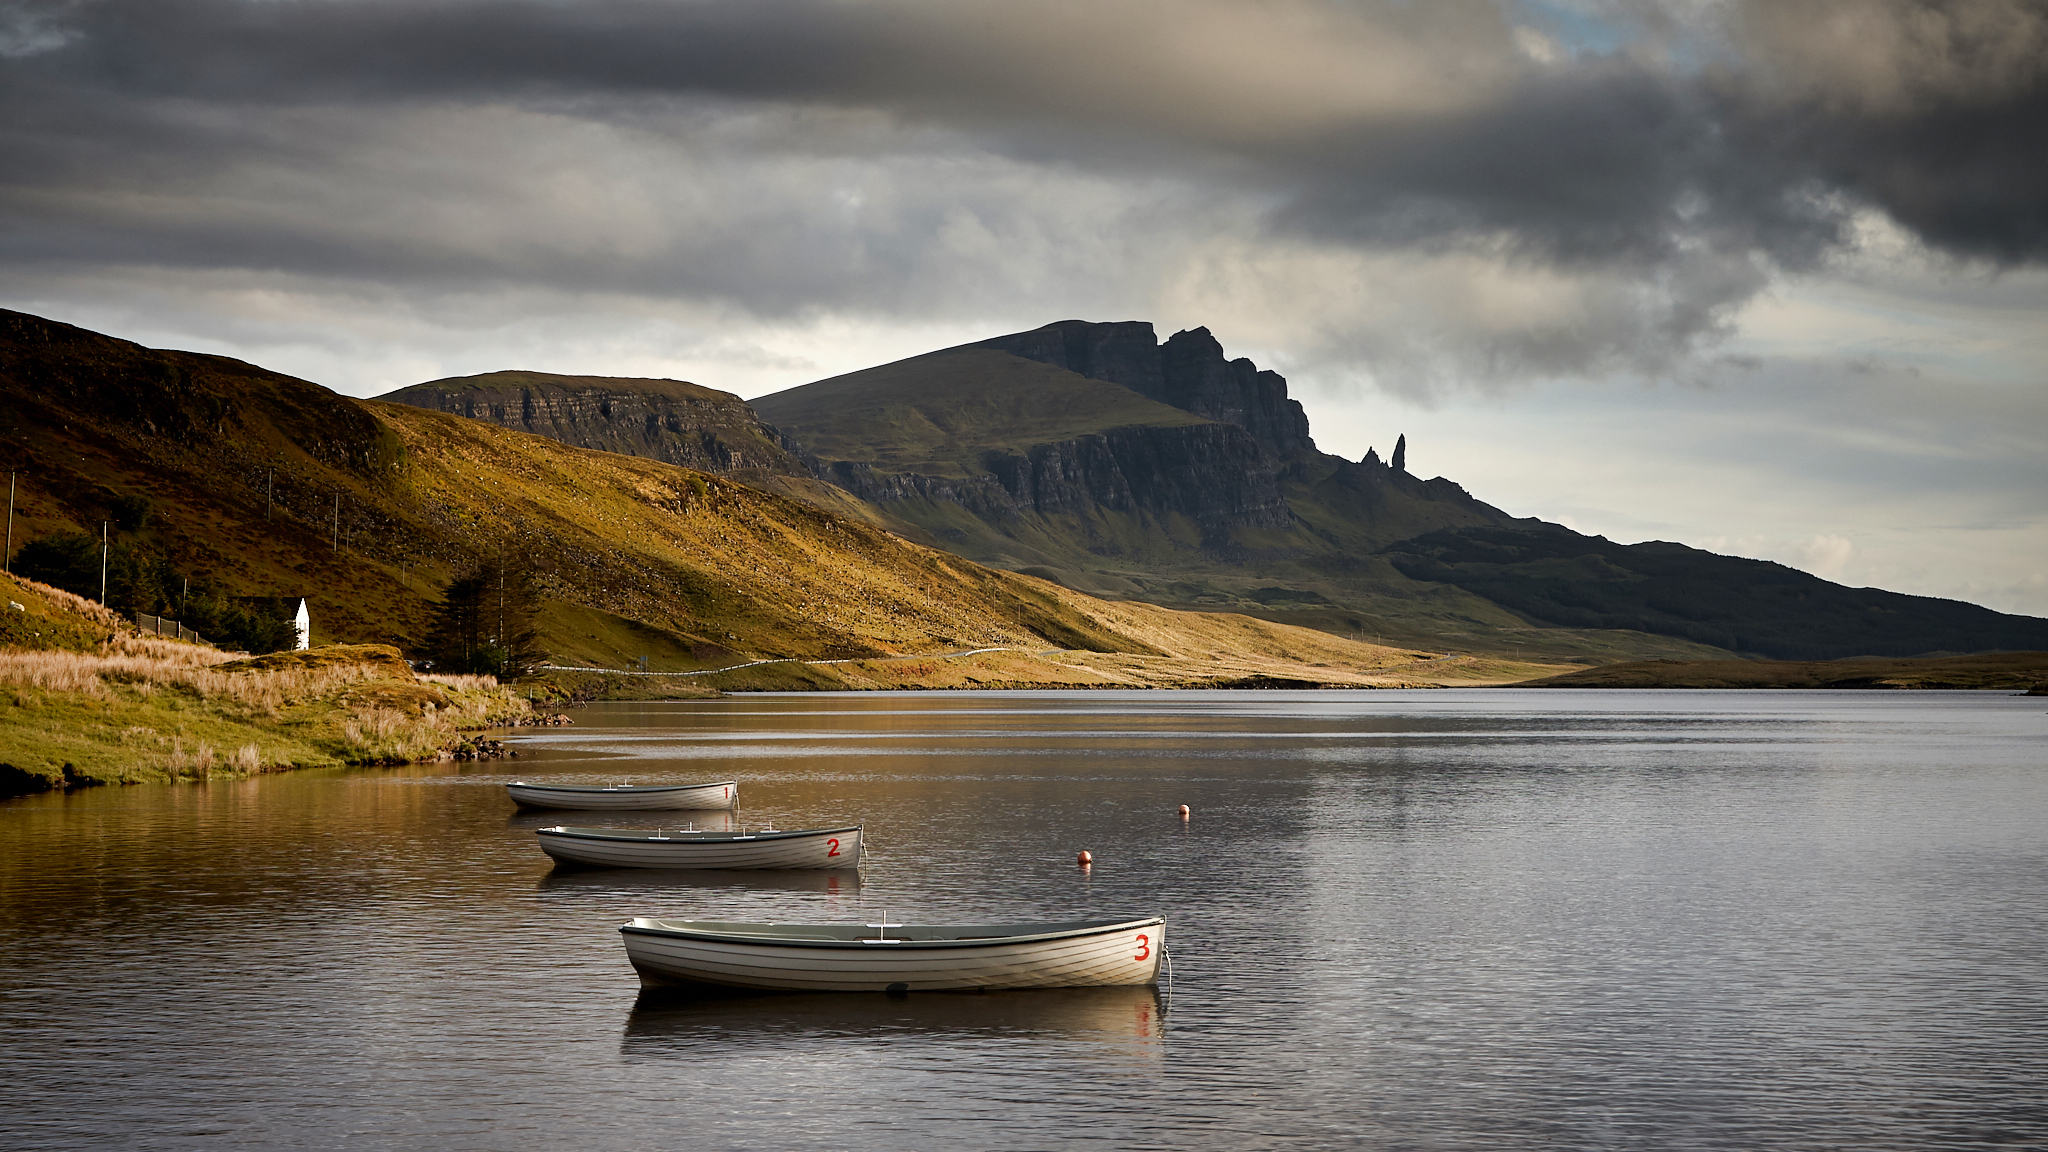 The Old Man of Storr Isle of Skye, Scotland